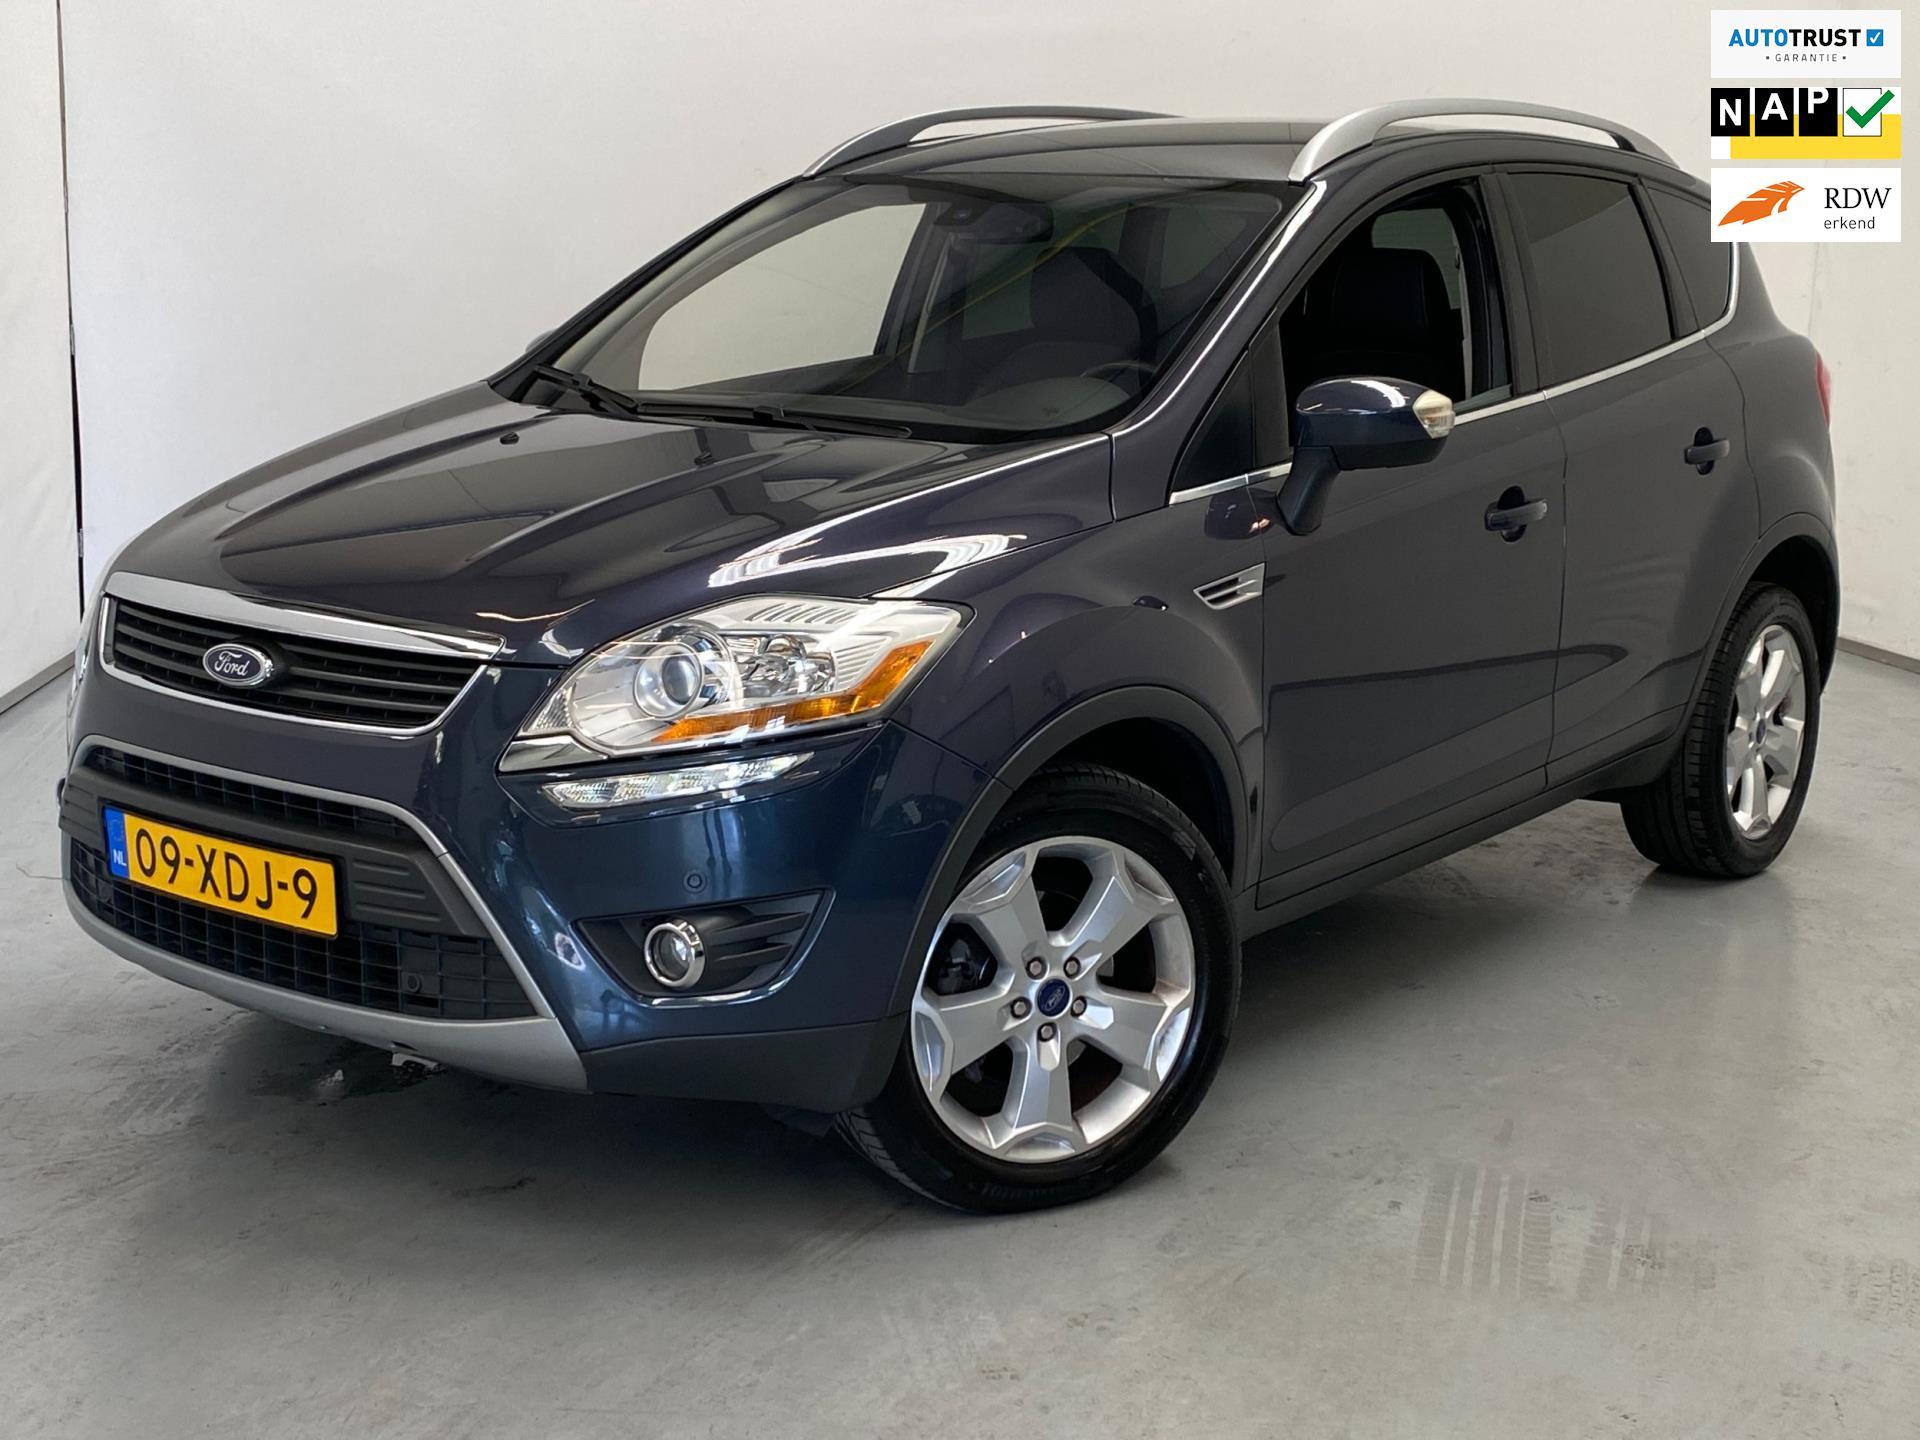 Ford Kuga occasion - Van den Brink Auto's